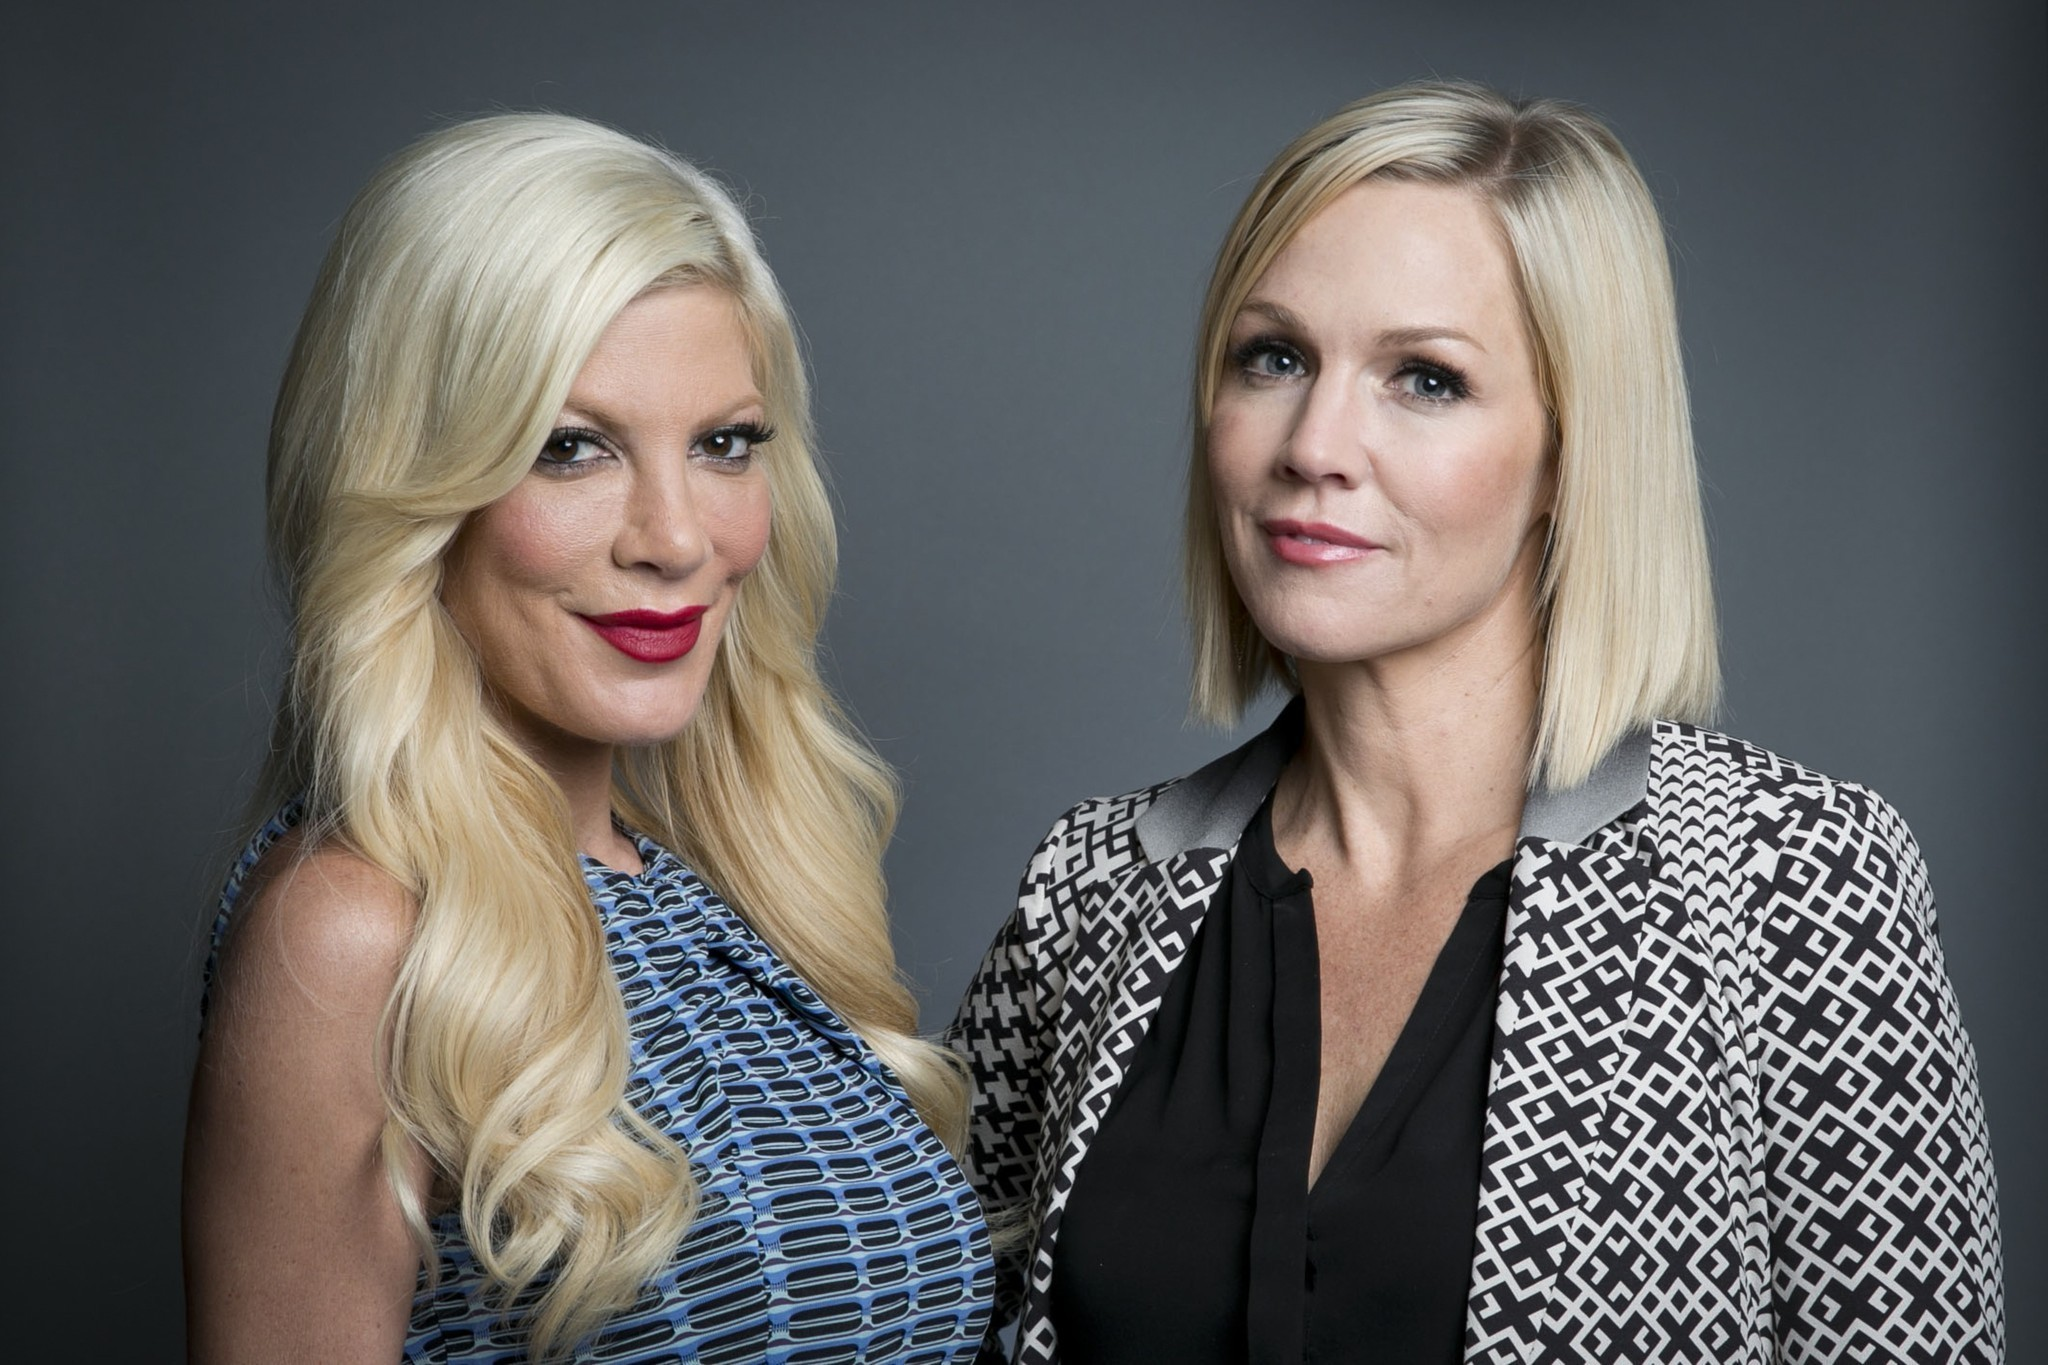 more drama jennie garth says reboot cast had no chemistry more 90210 drama jennie garth says reboot cast had no chemistry la times